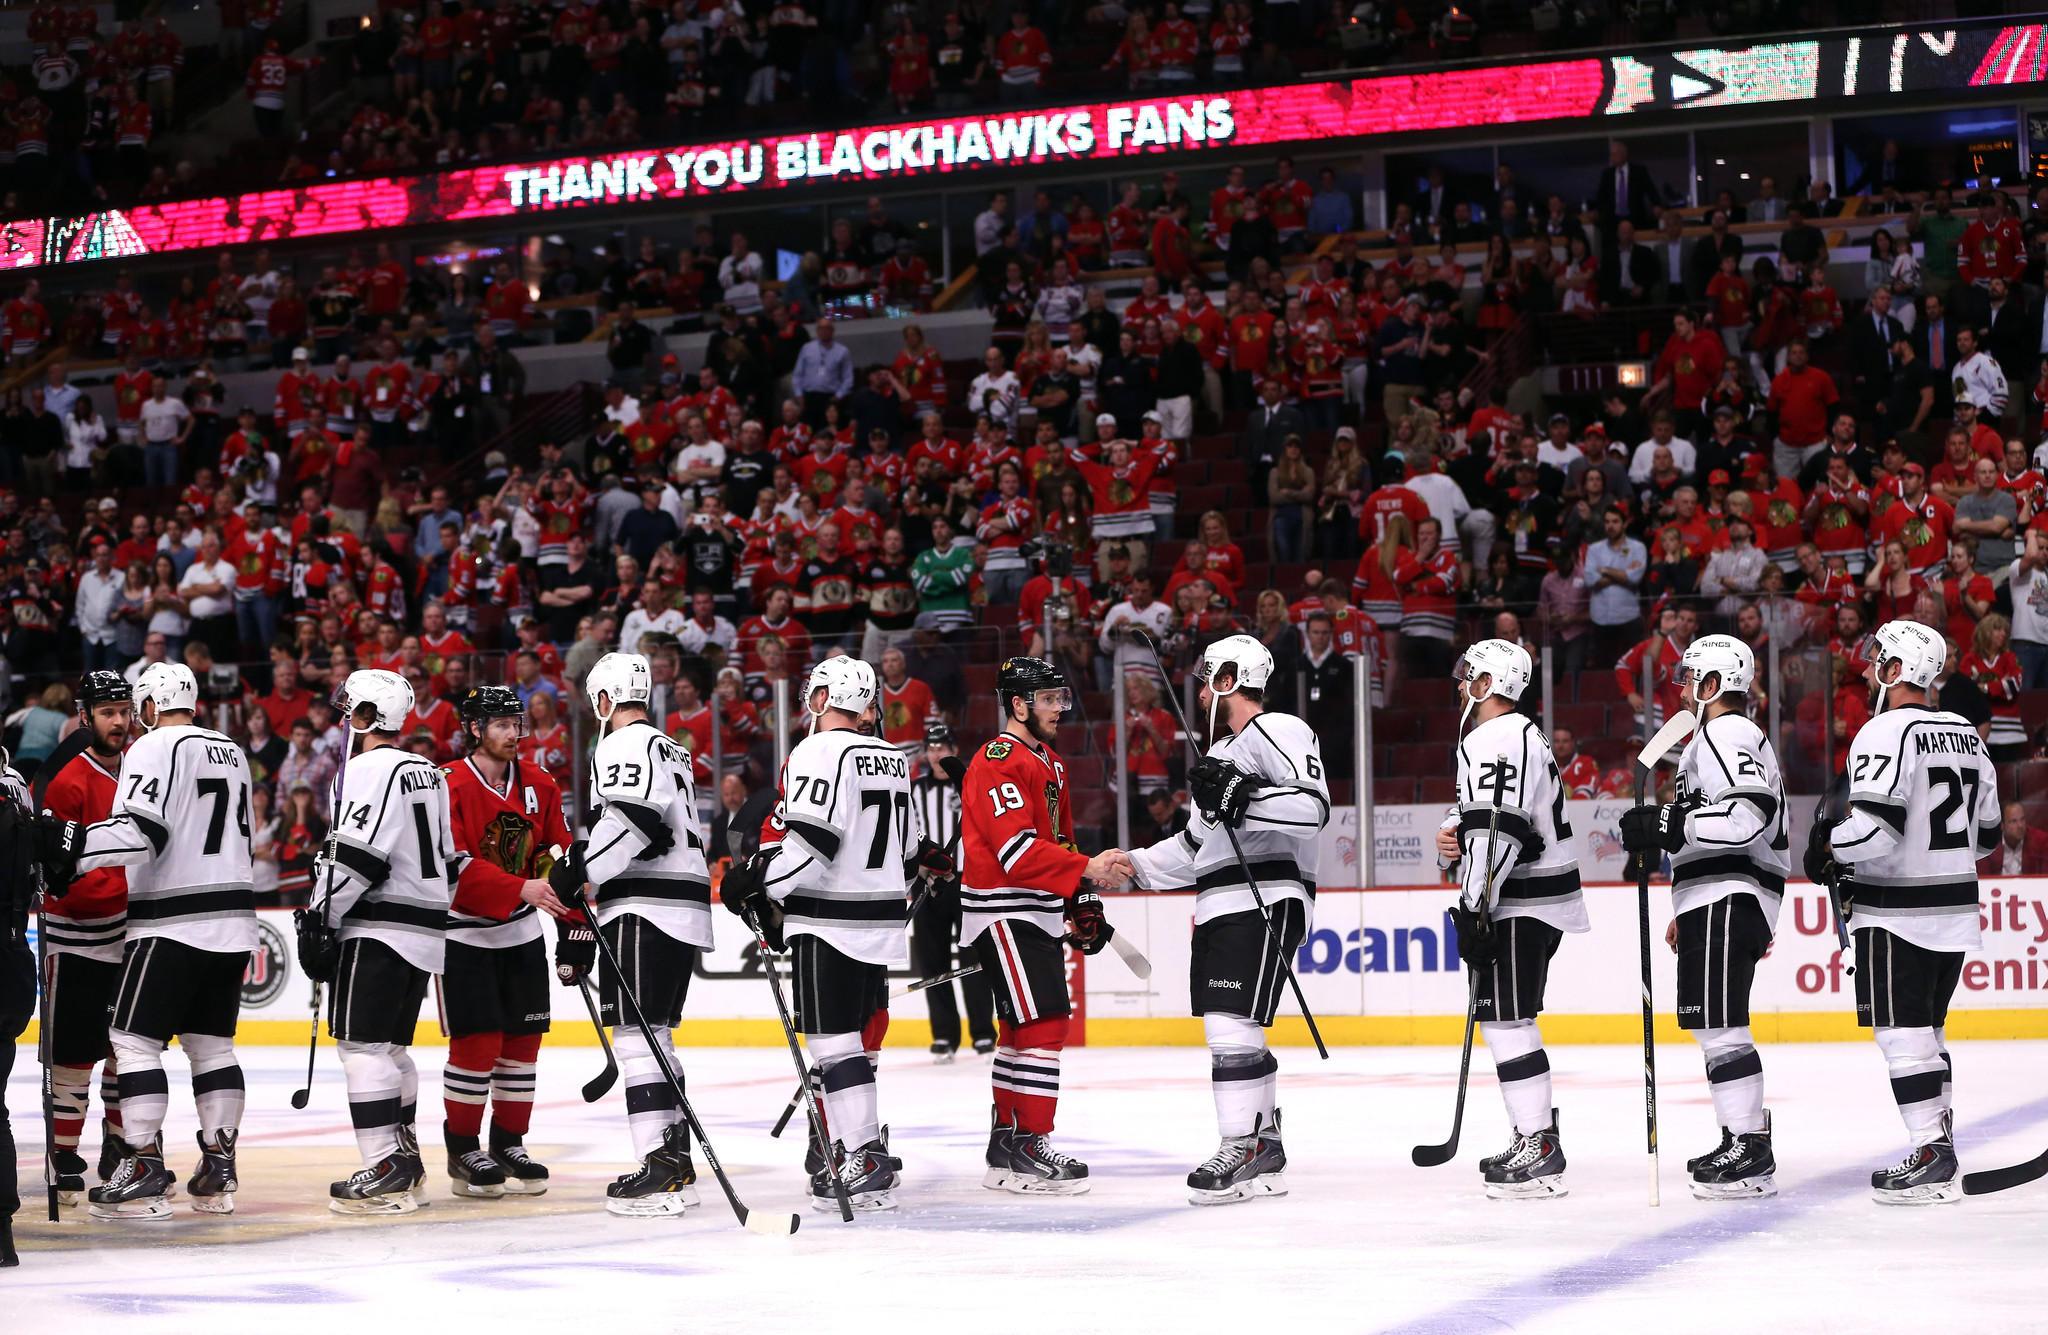 chi-blackhawks-fans-thanked-20140602